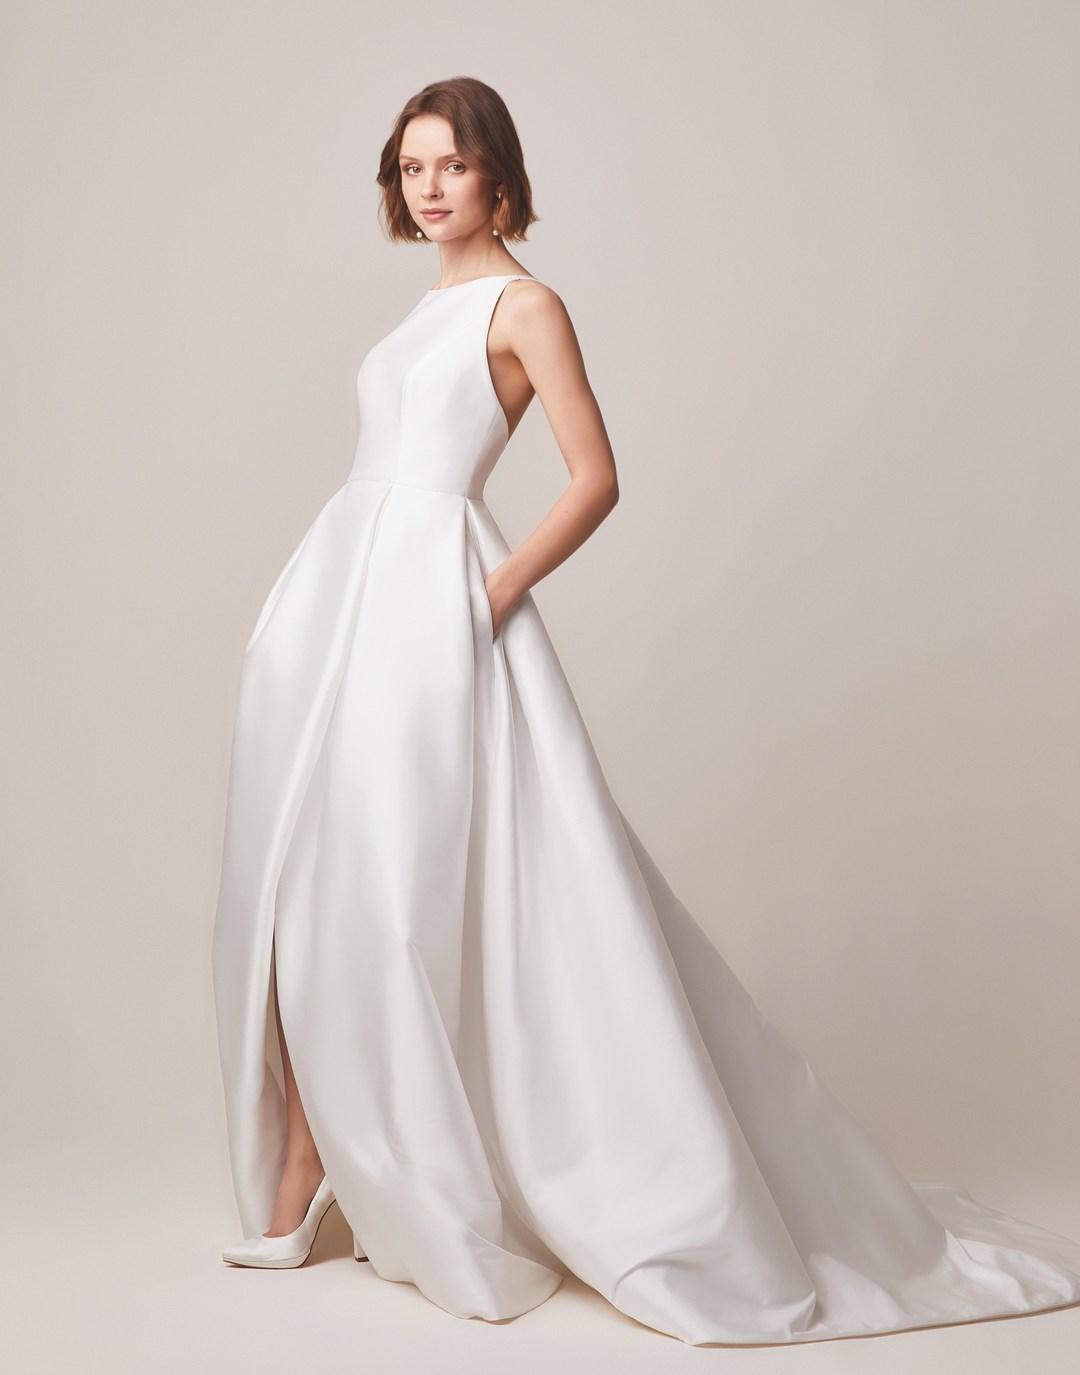 121 dress photo